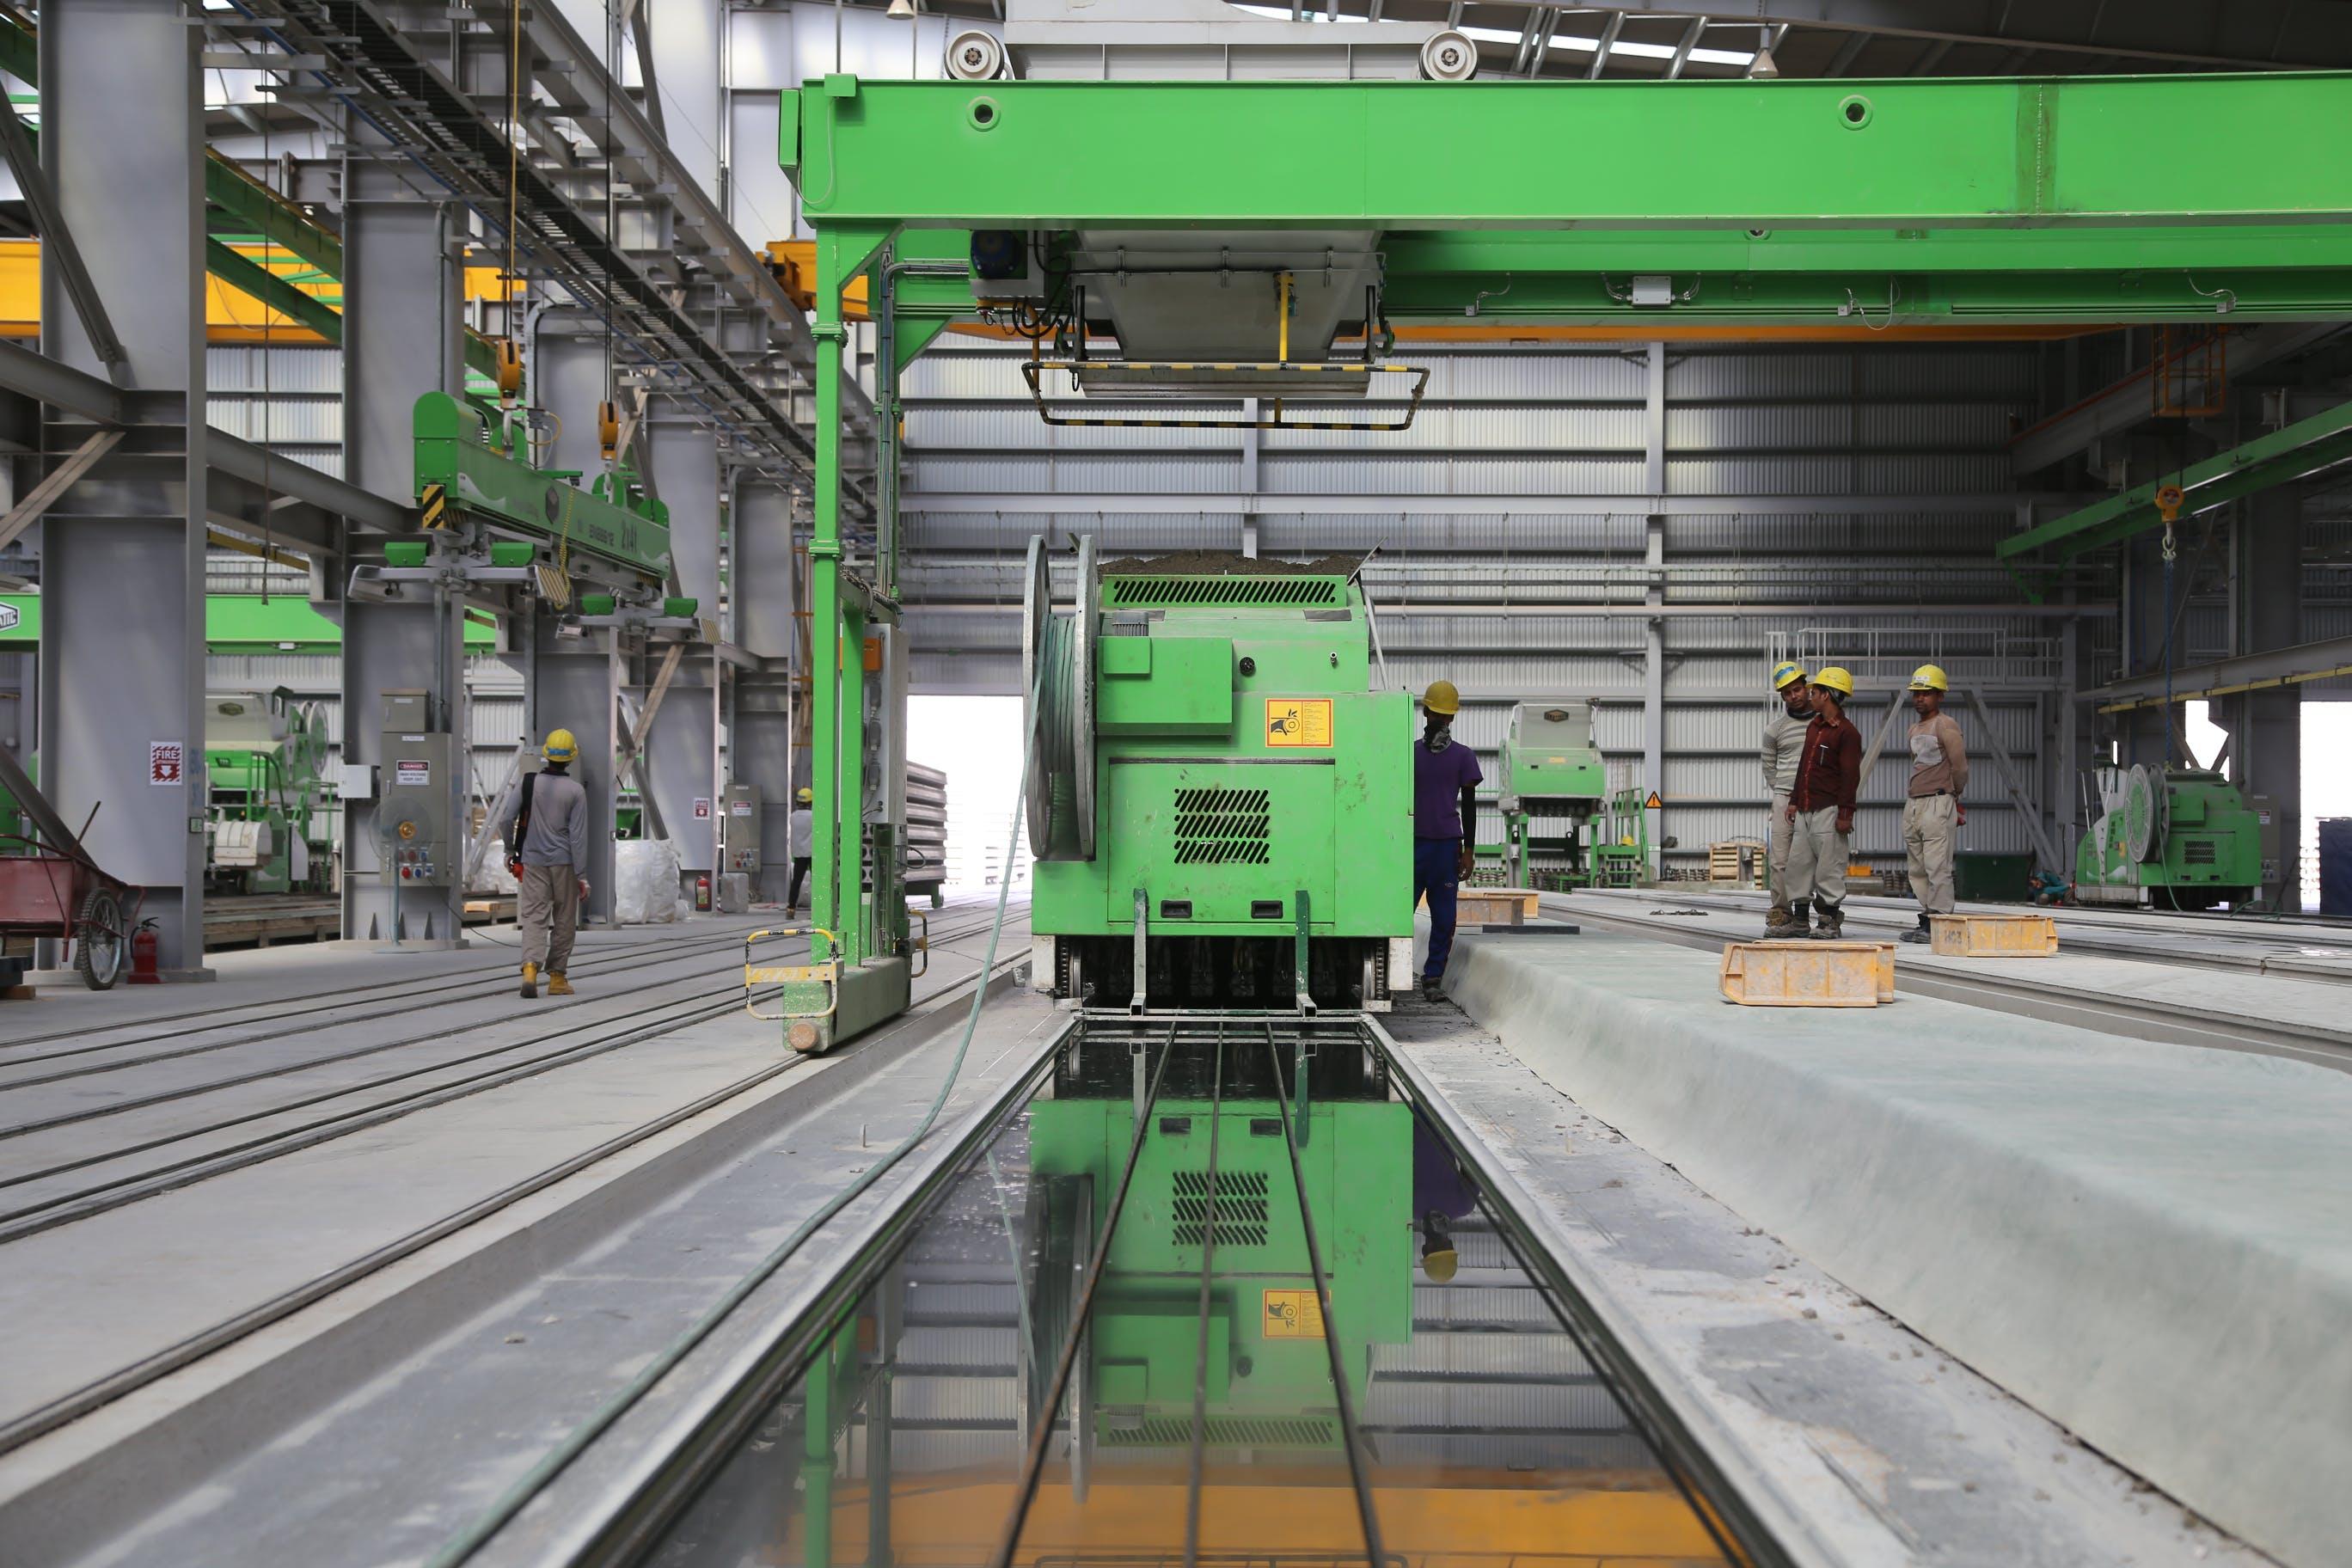 People Stands Near Green Metal Industrial Machine